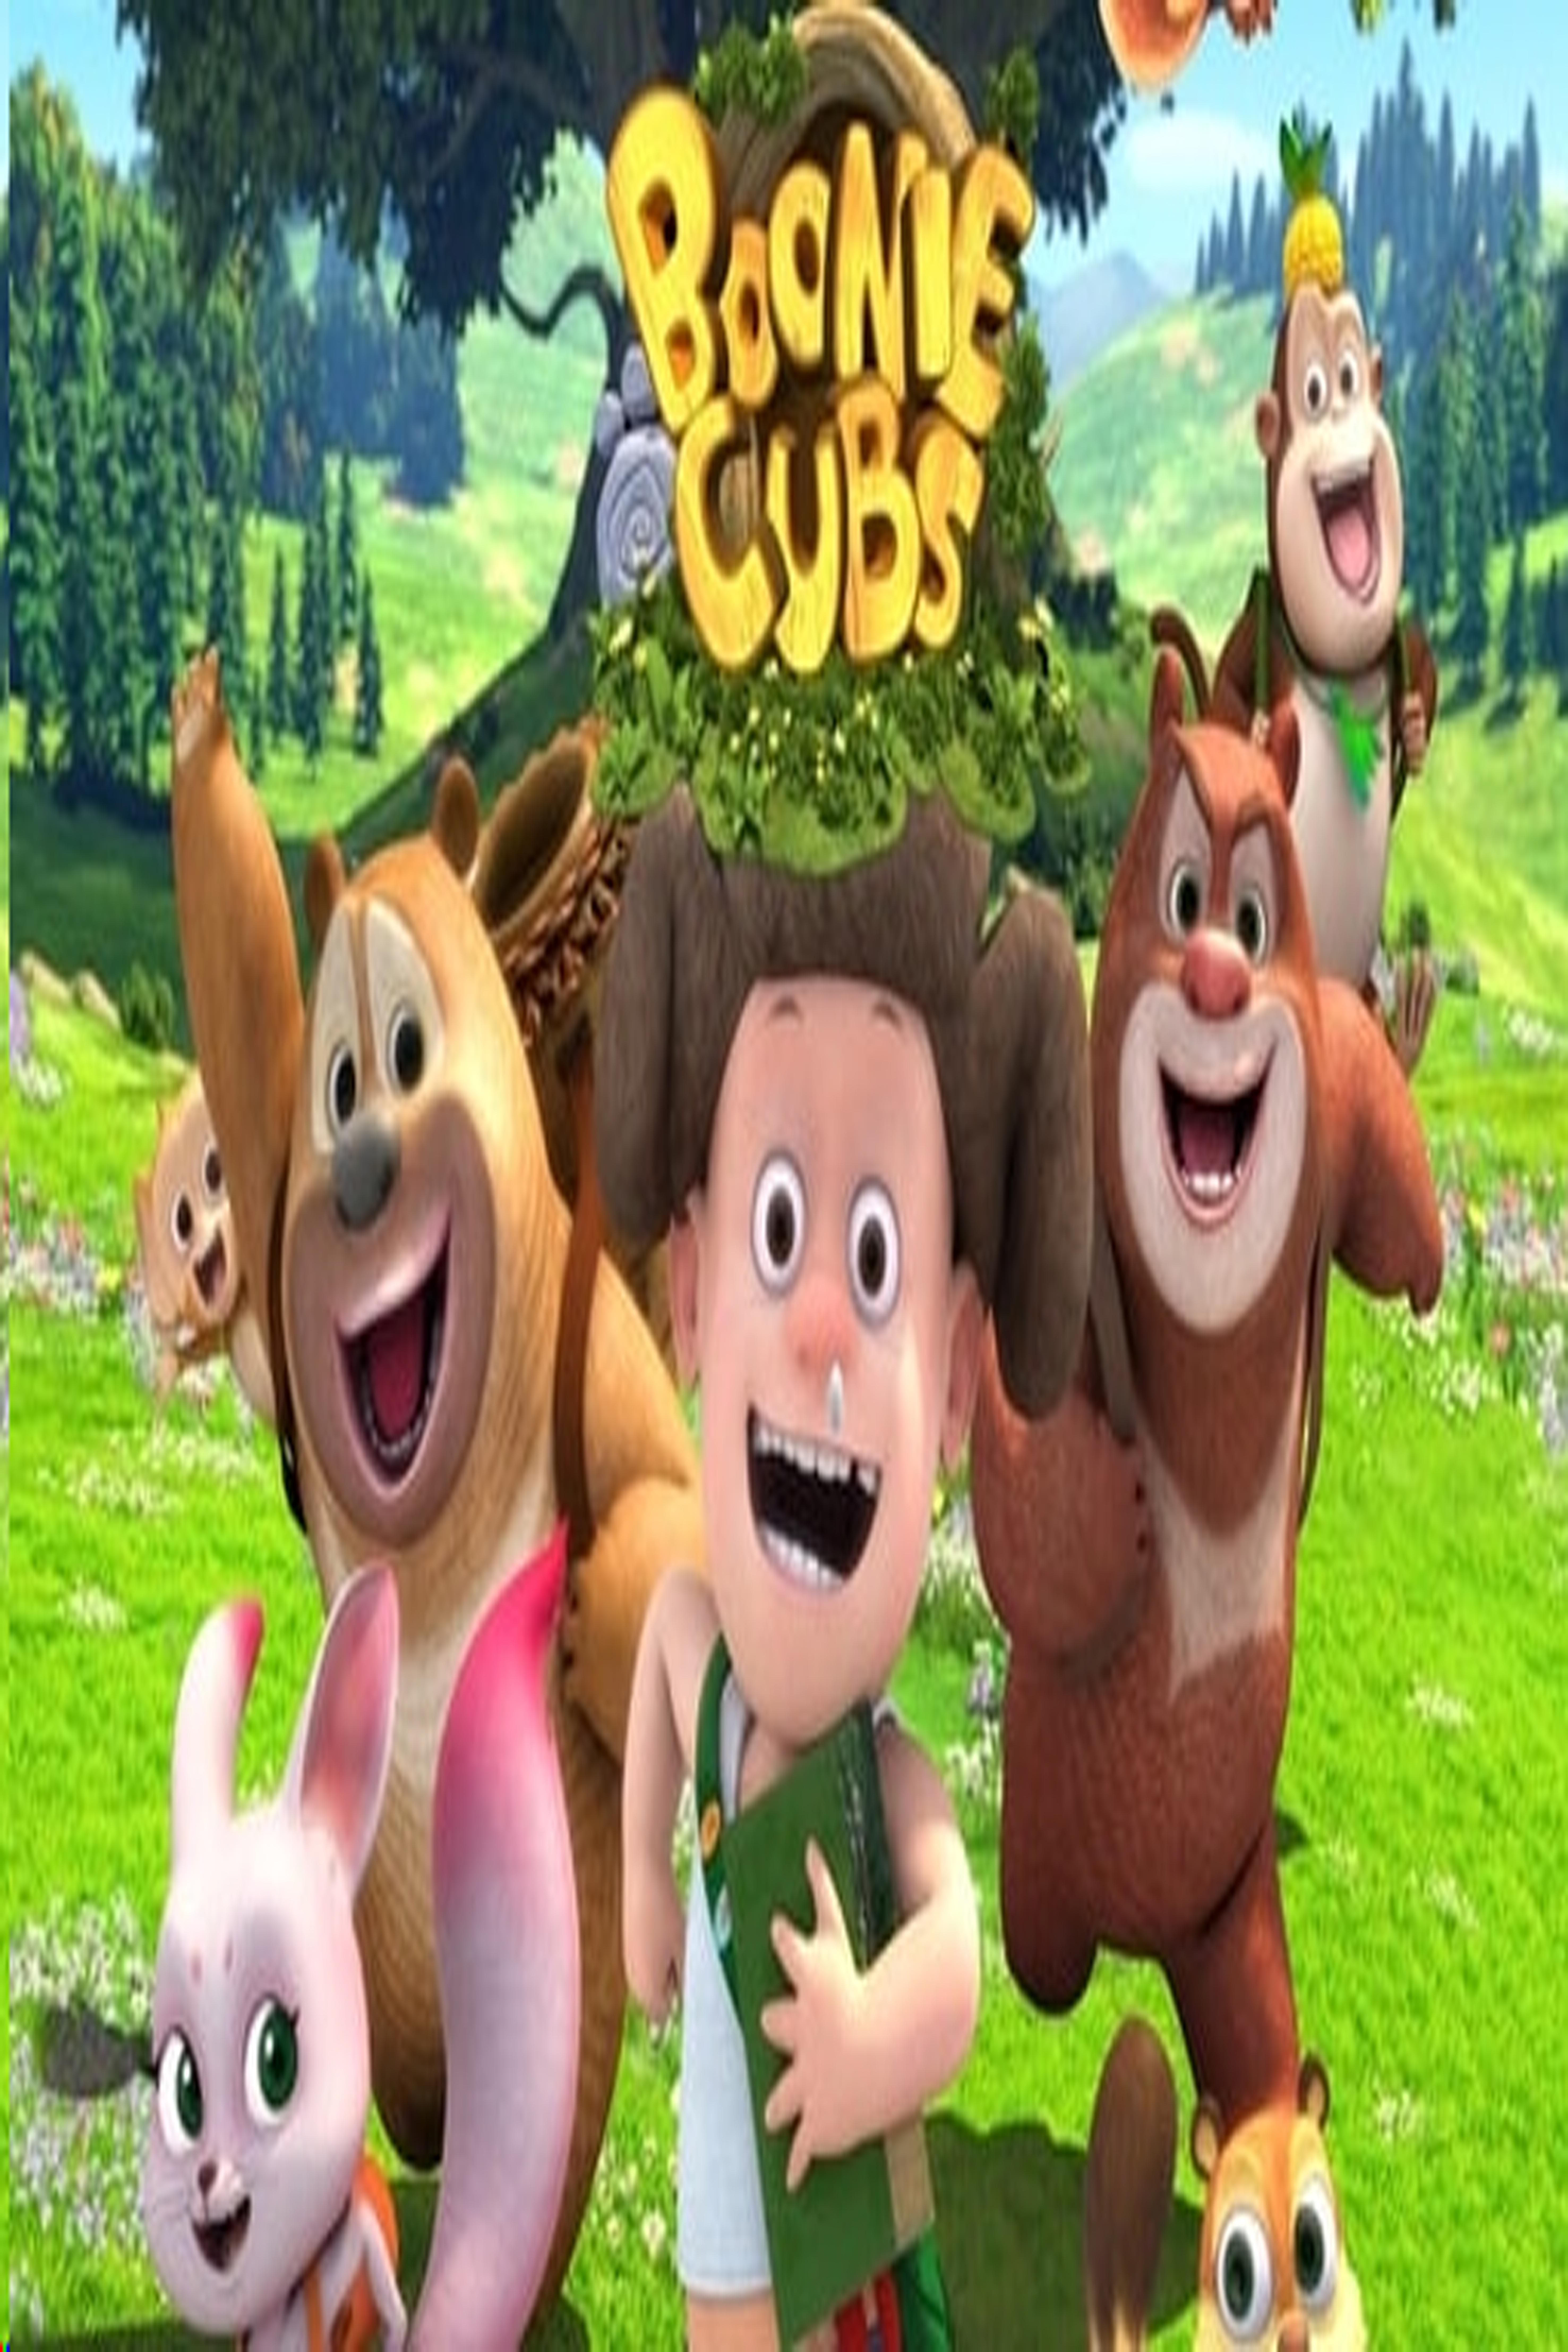 Watch Boonie Cubs - 熊熊樂園